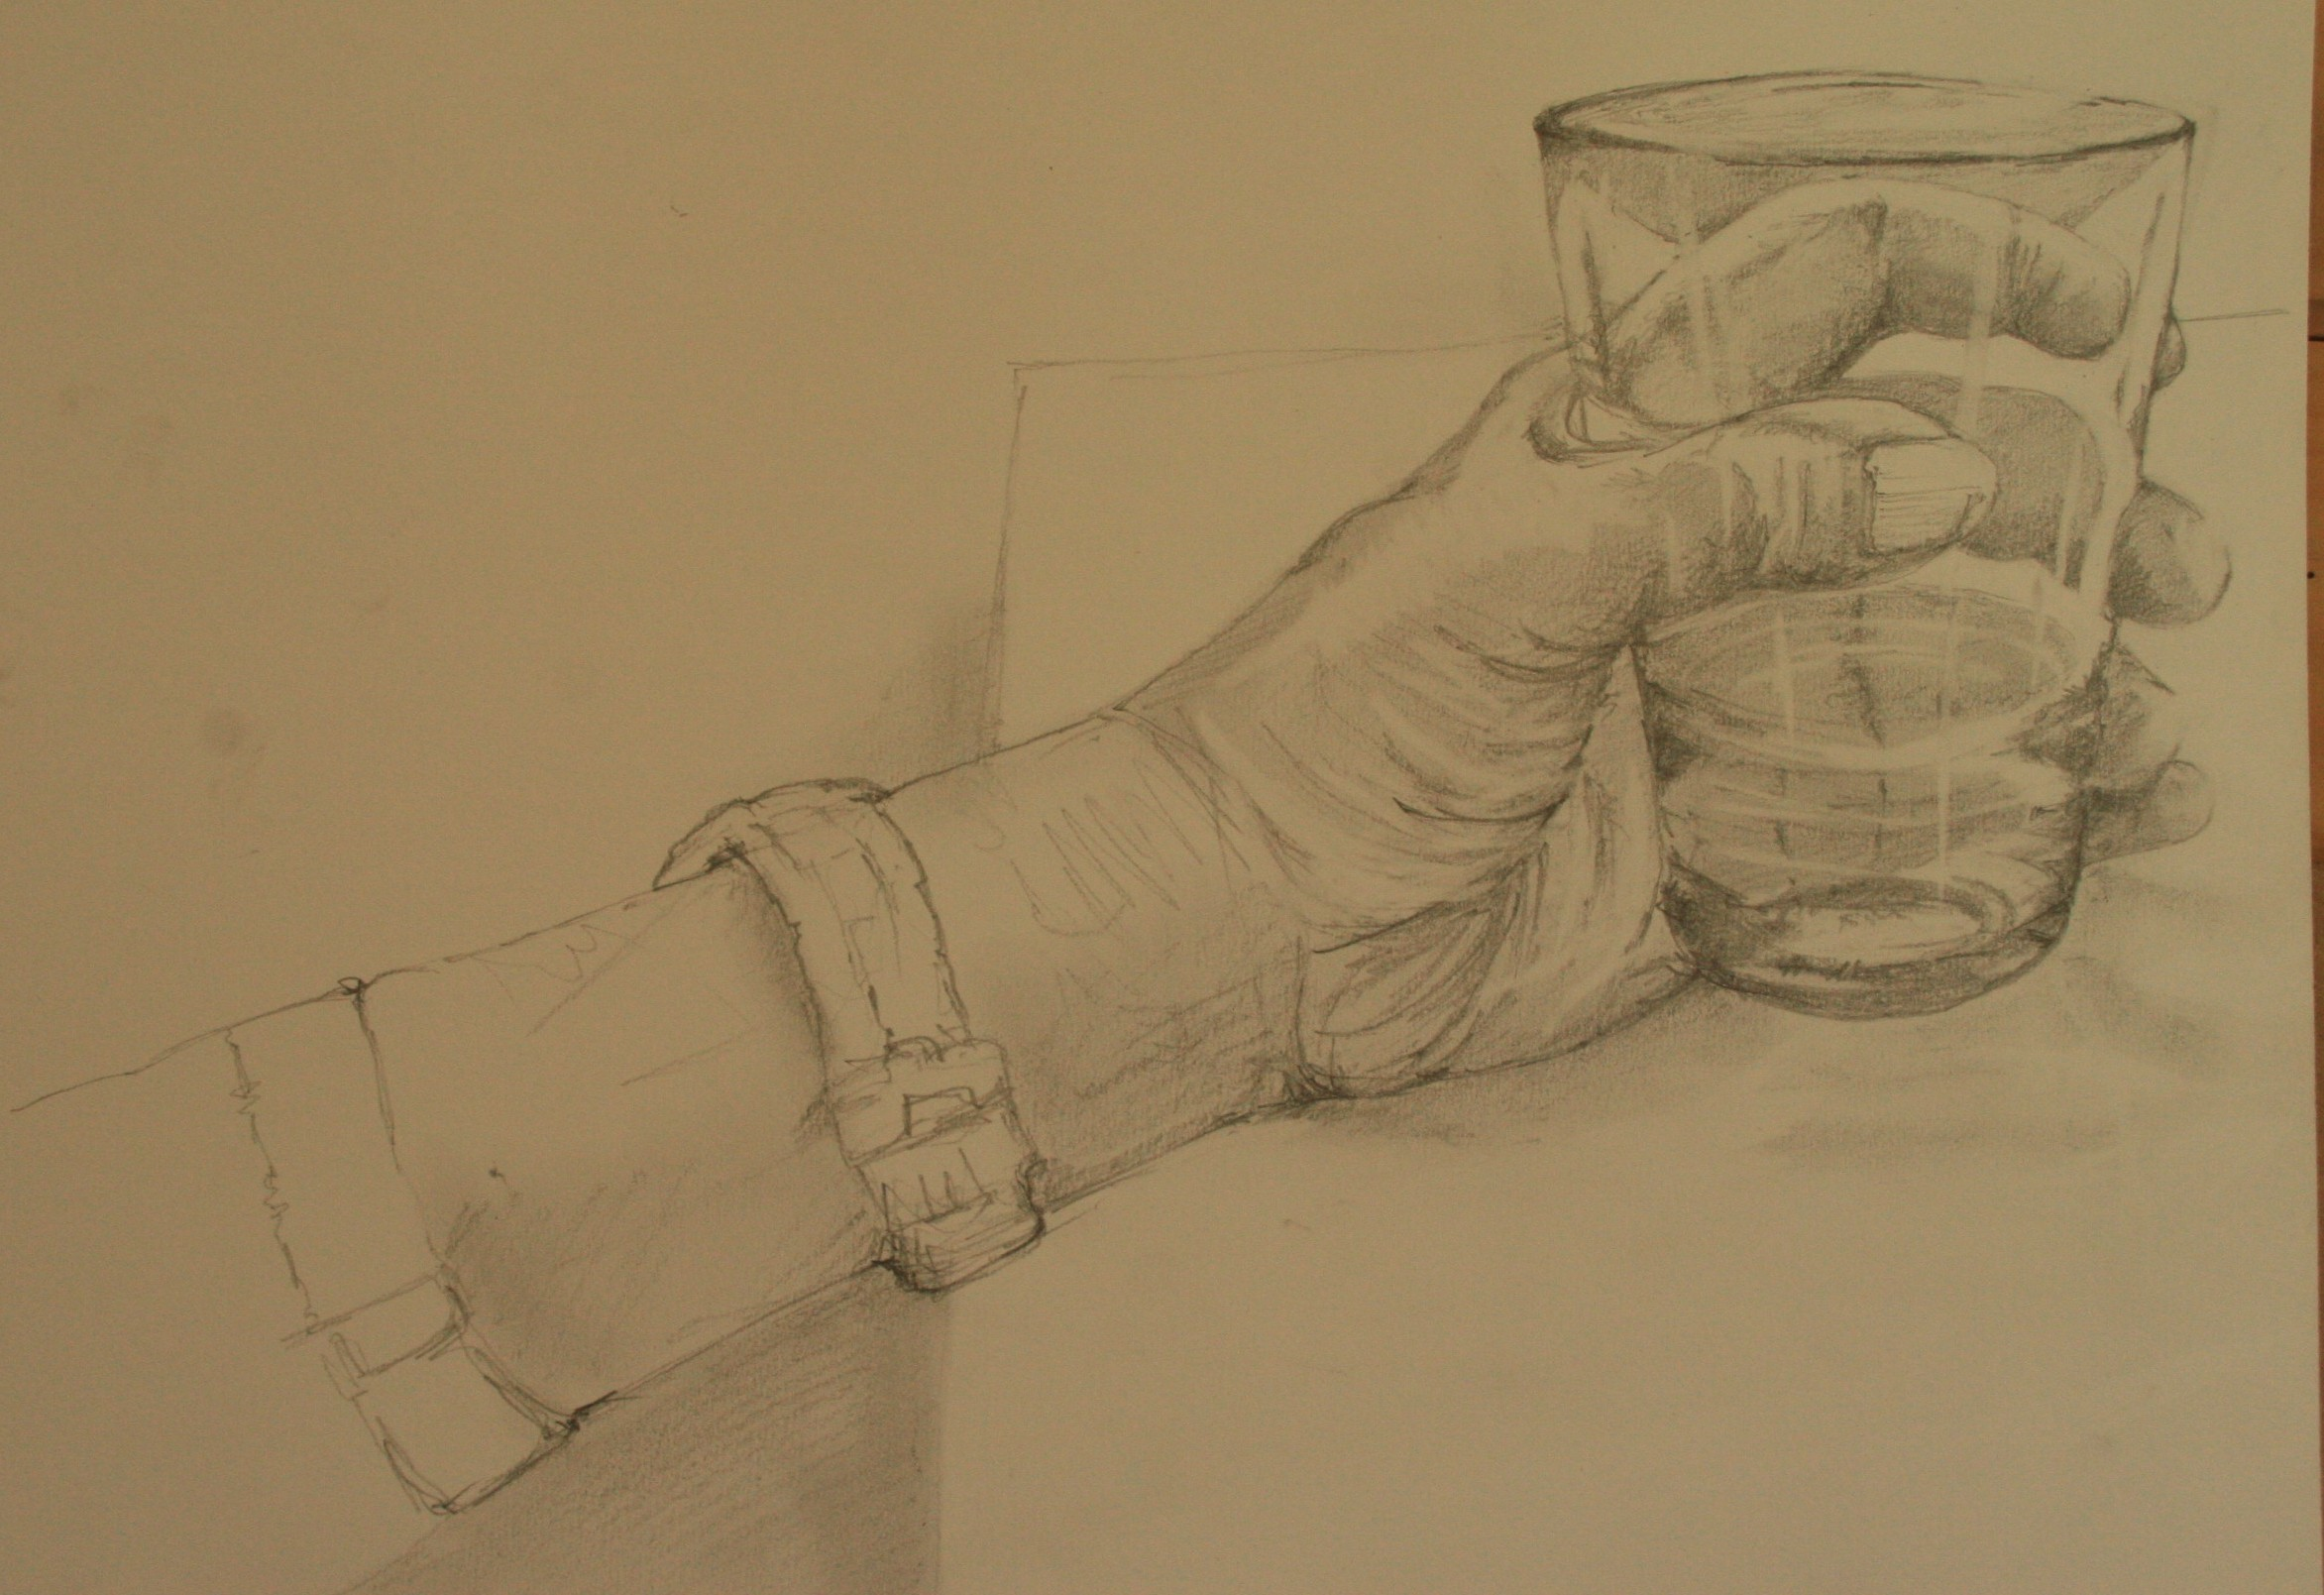 2345x1609 Phil Reynolds Fine Art Hands Holding A Glass